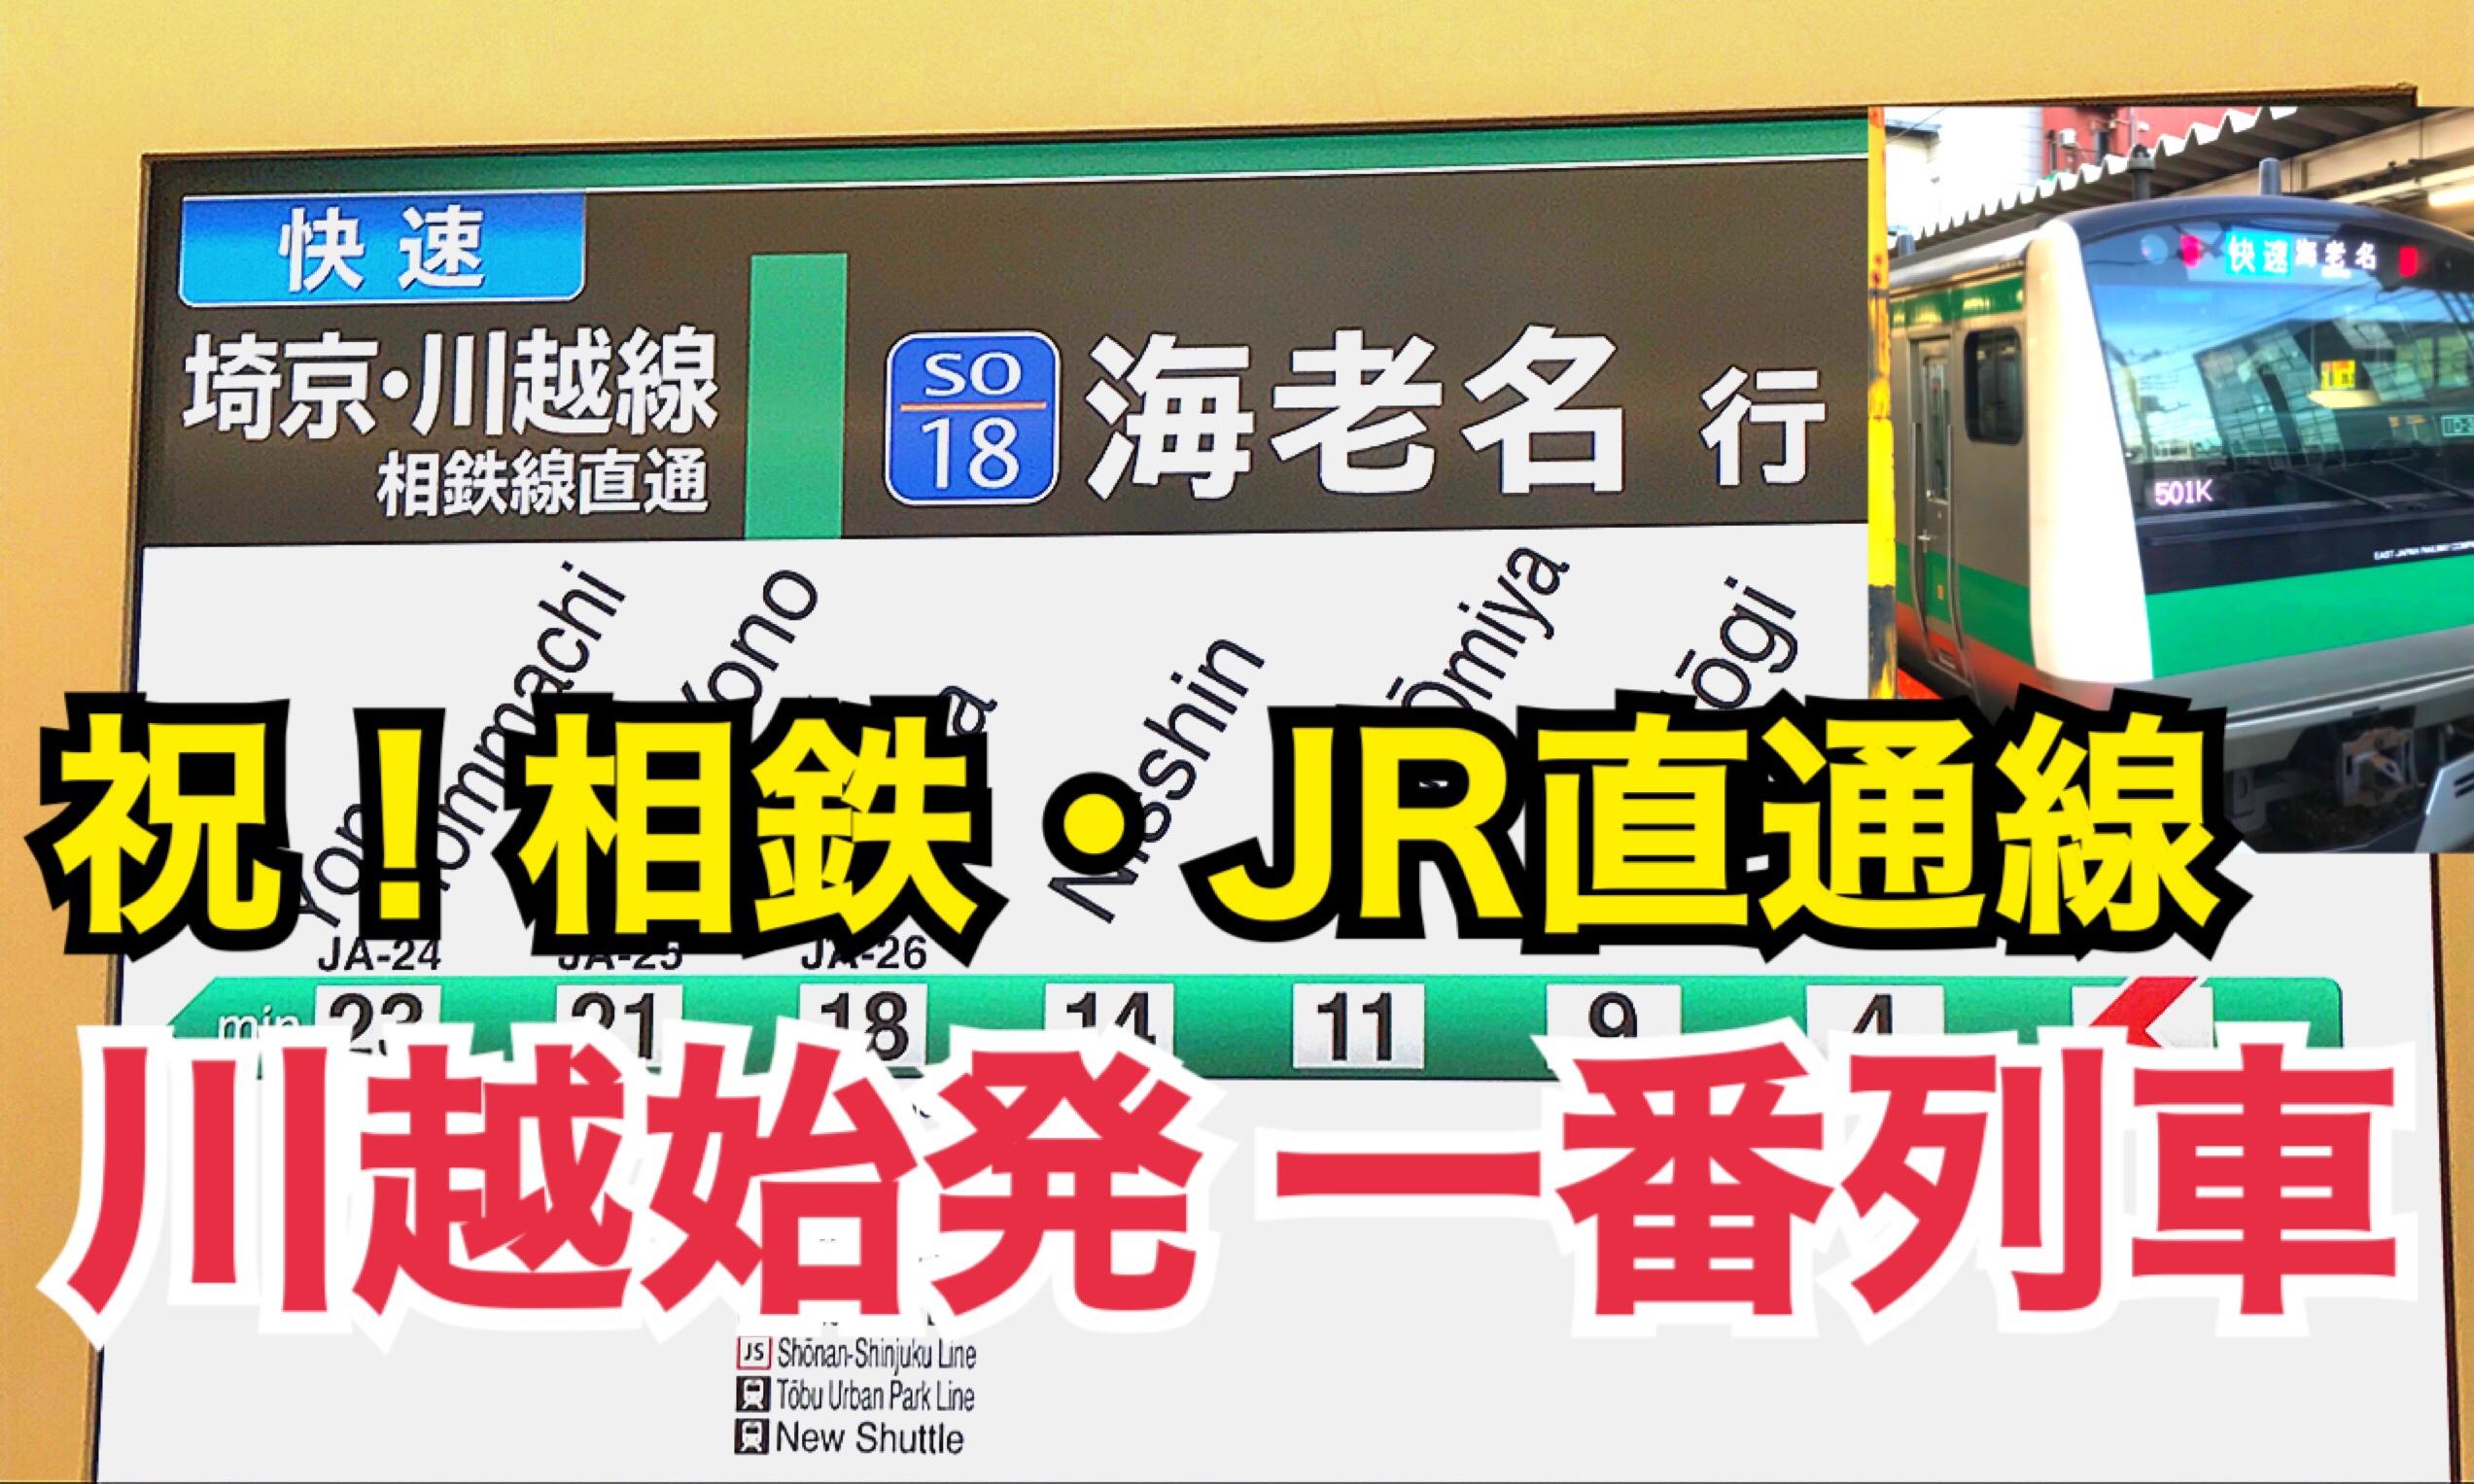 相鉄・JR直通線開業!川越始発一番列車に乗車!【相鉄・JRの旅】